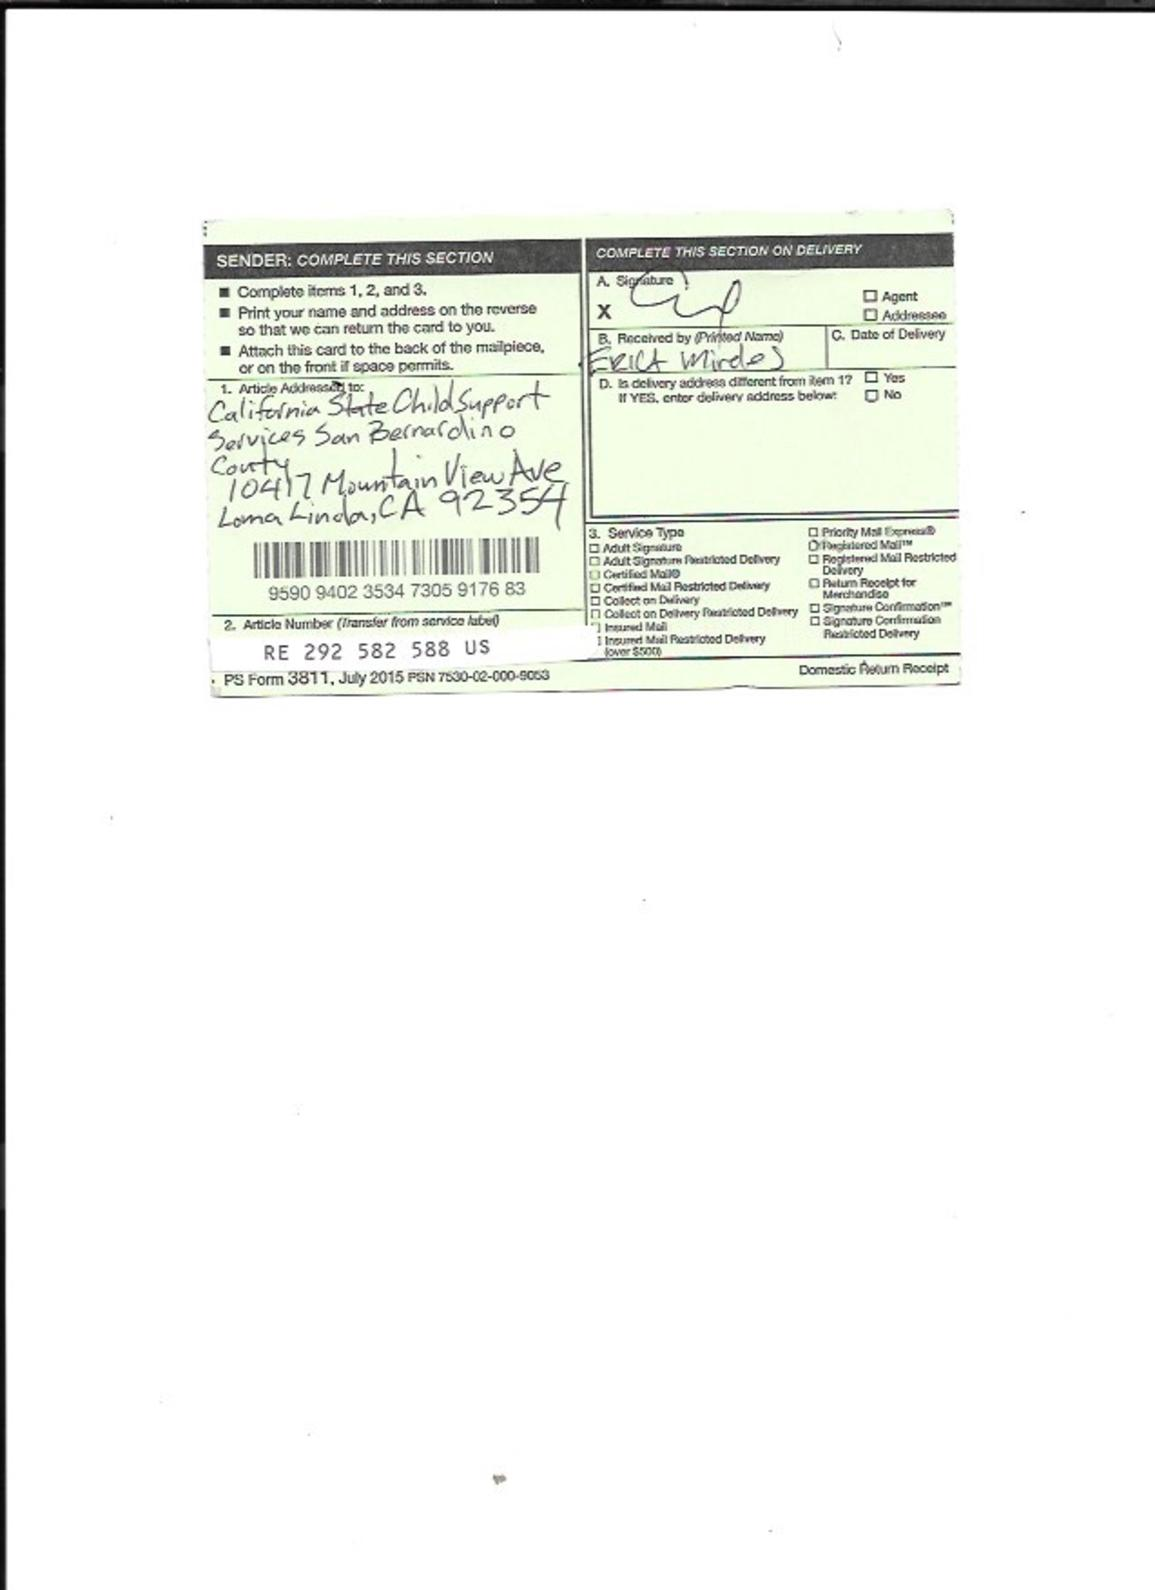 Calaméo - Statutory Claim Registered Mail to California State